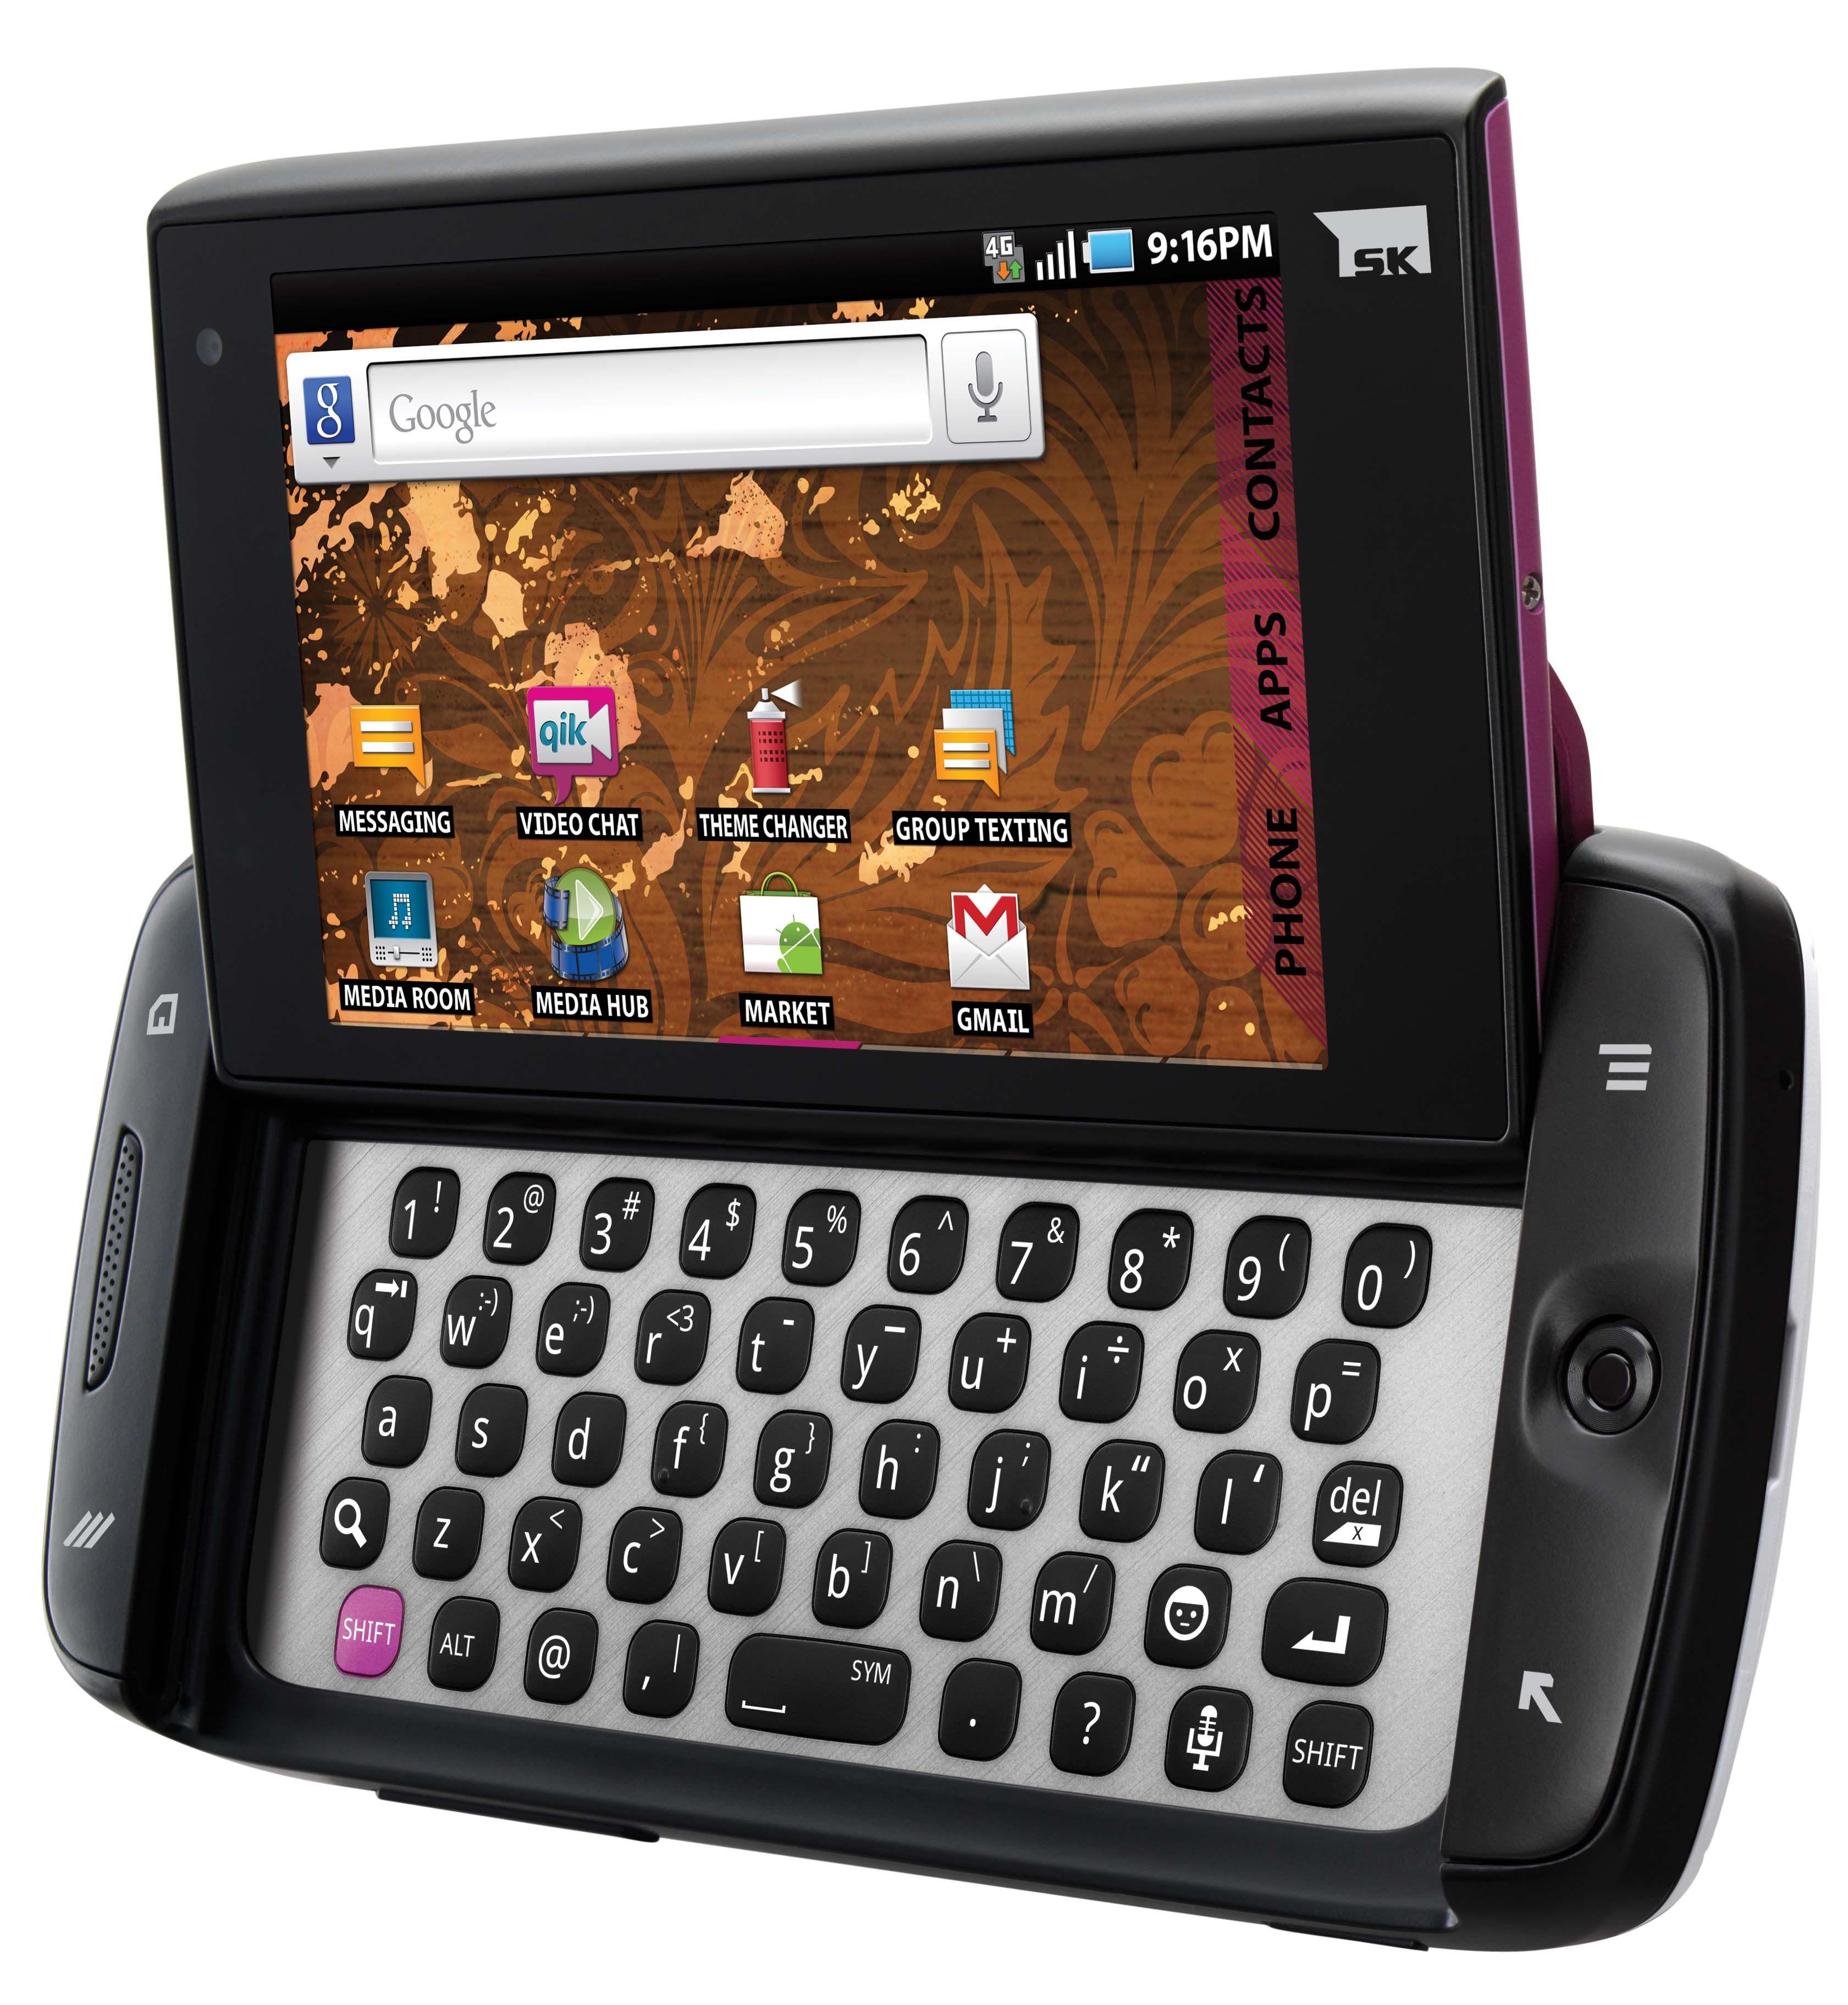 TMobile Samsung T839 Sidekick 4G Android Smartphone http